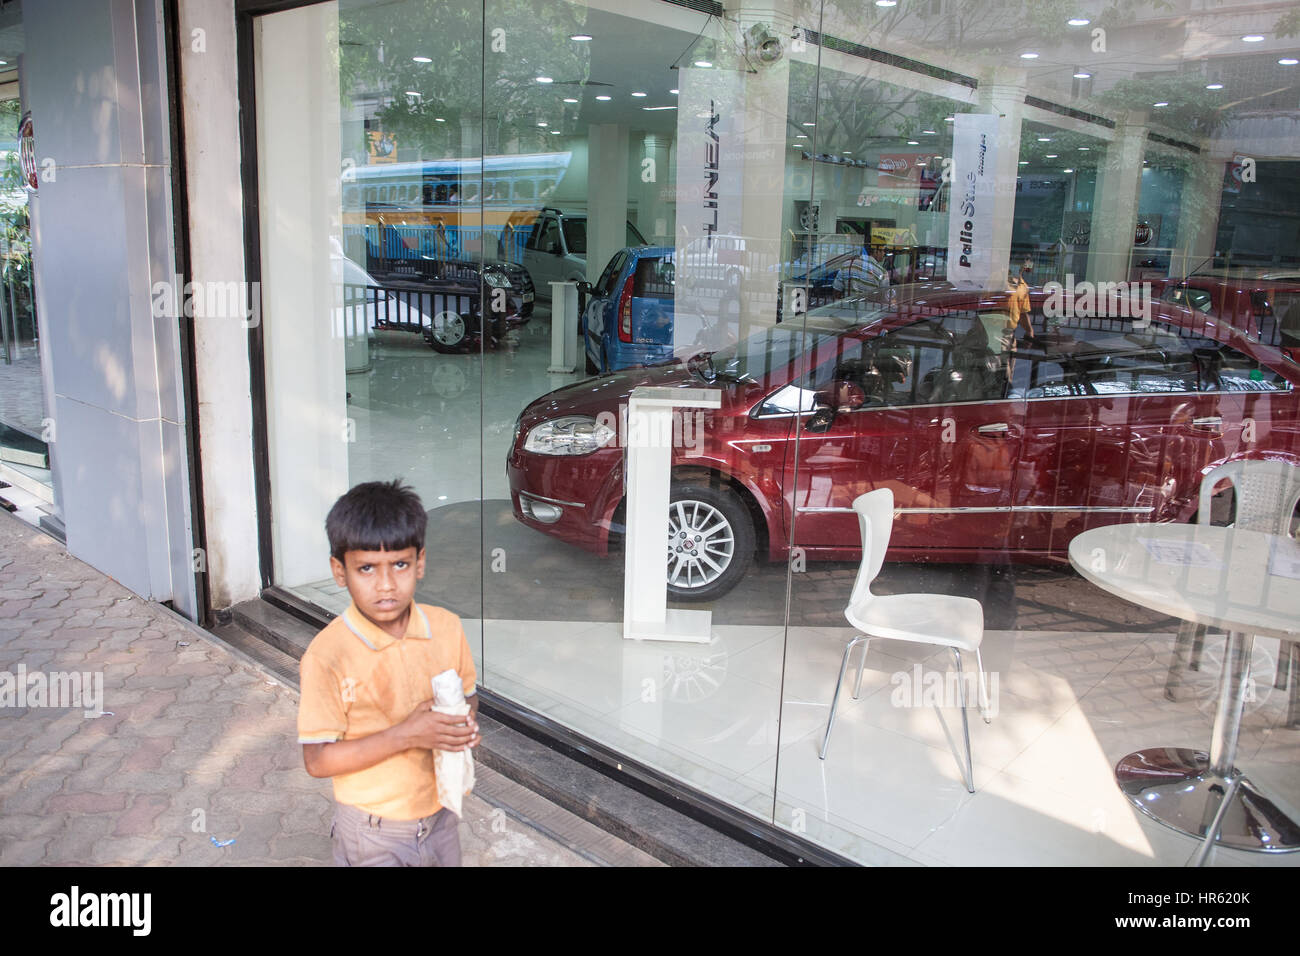 Calcutta India Car Showroom Stock Photos Calcutta India Car